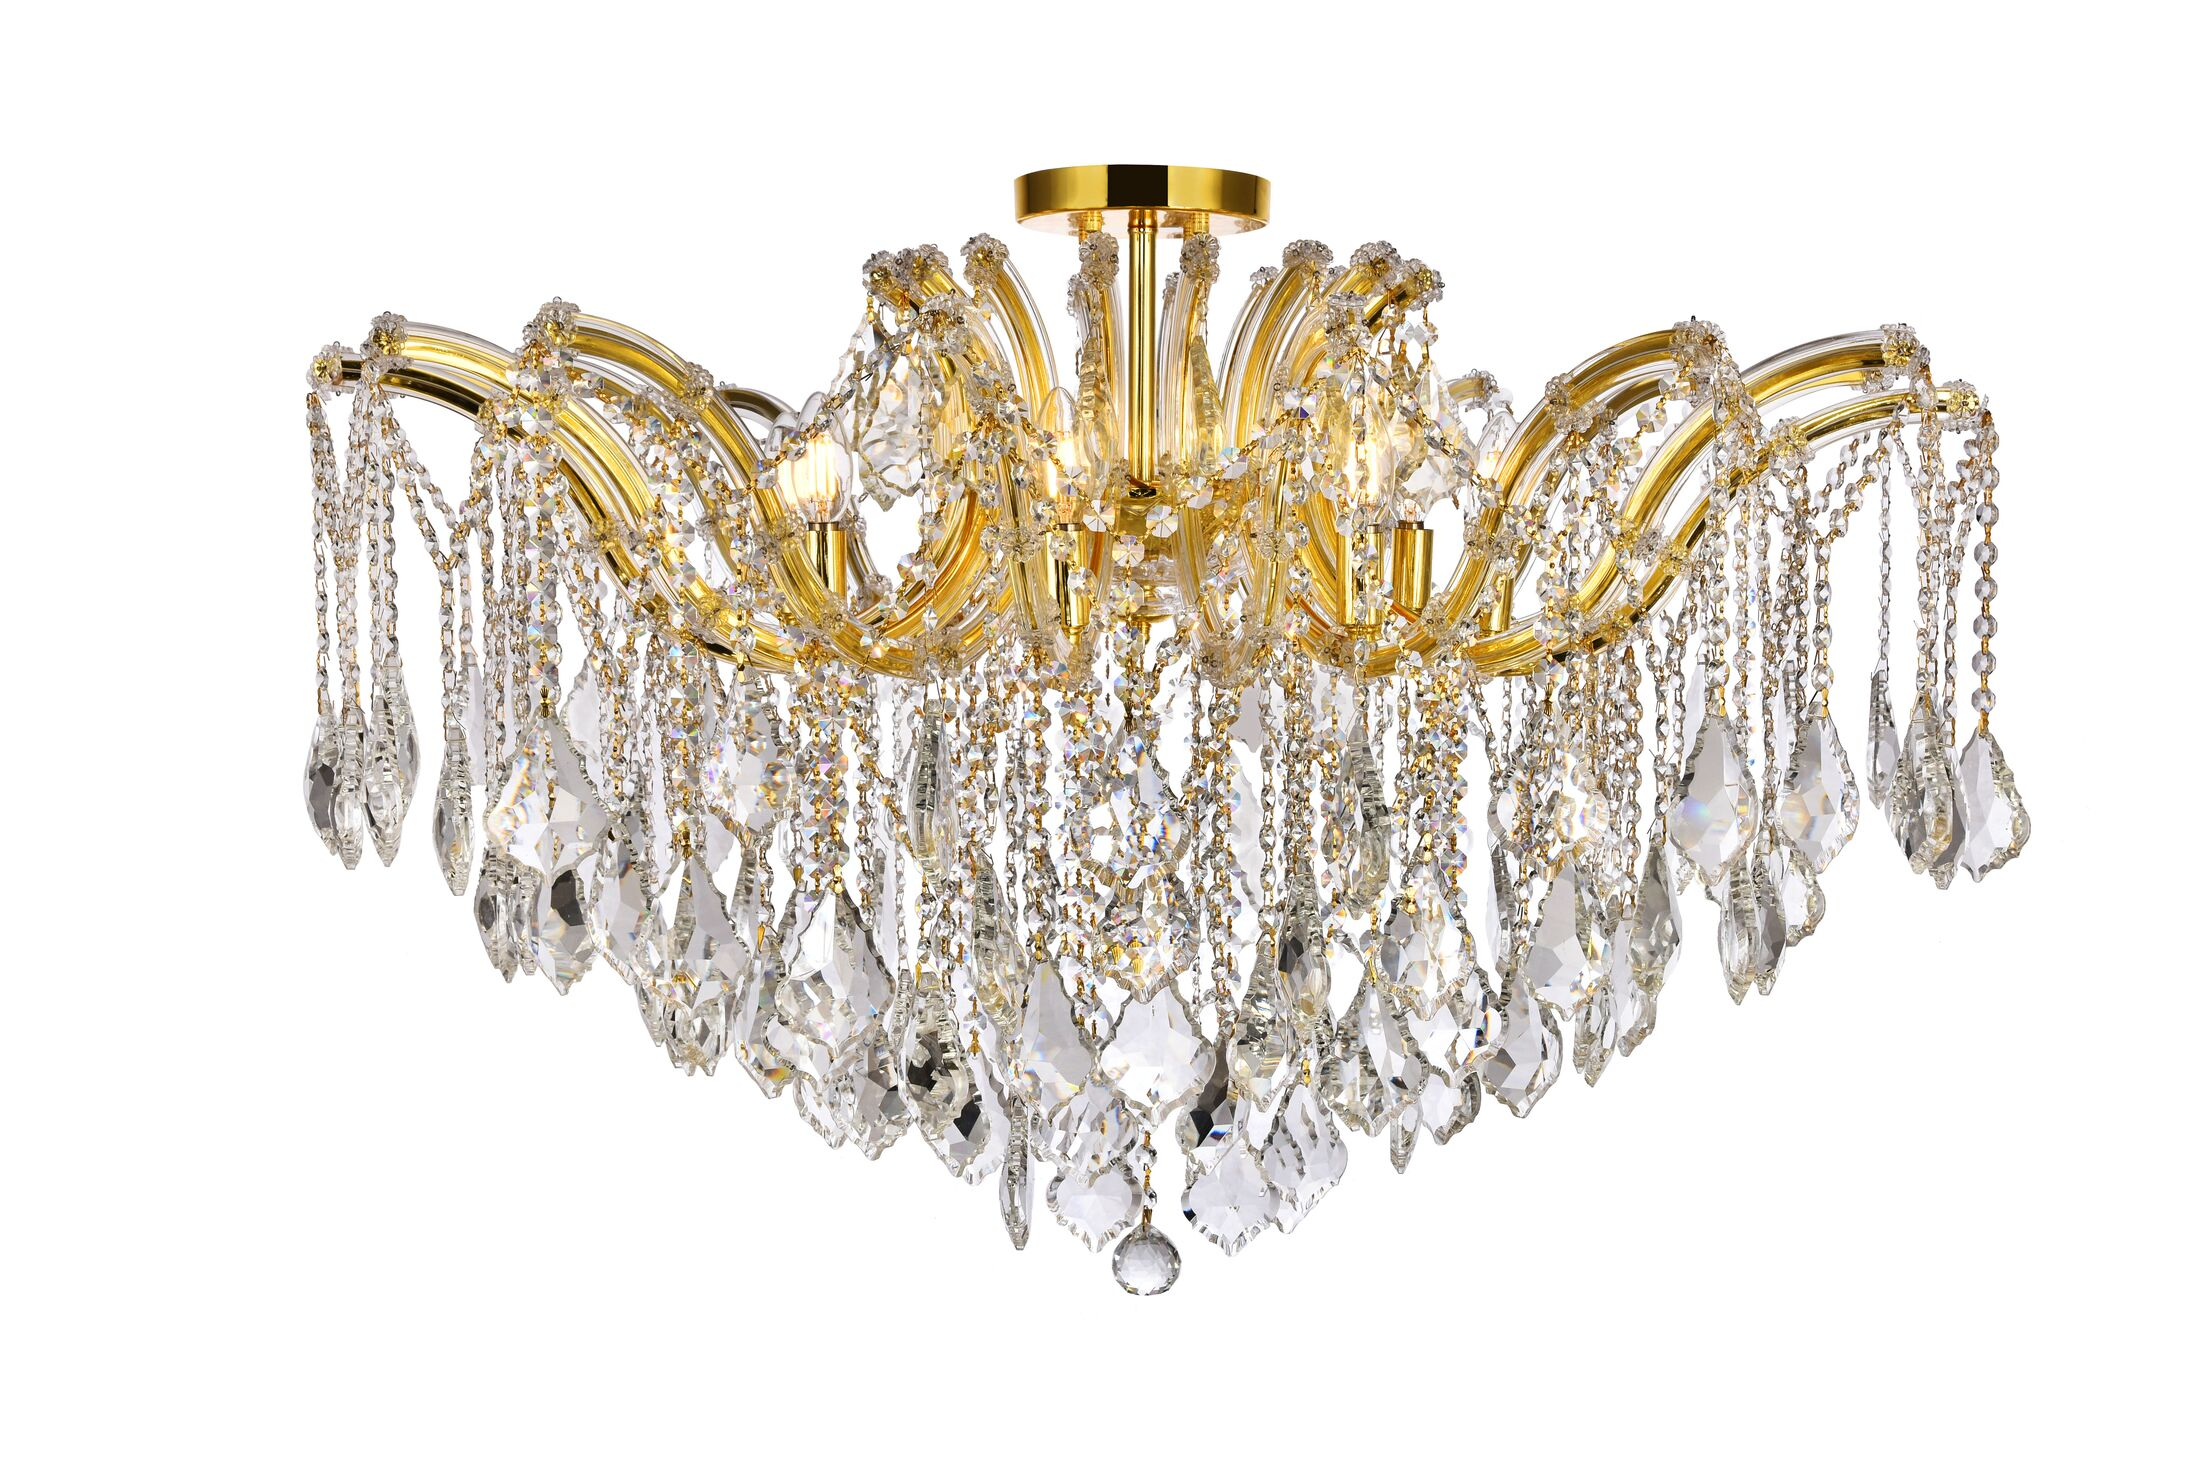 Regina 8-Light Semi Flush Mount Fixture Finish: Gold, Crystal Type: Royal Cut